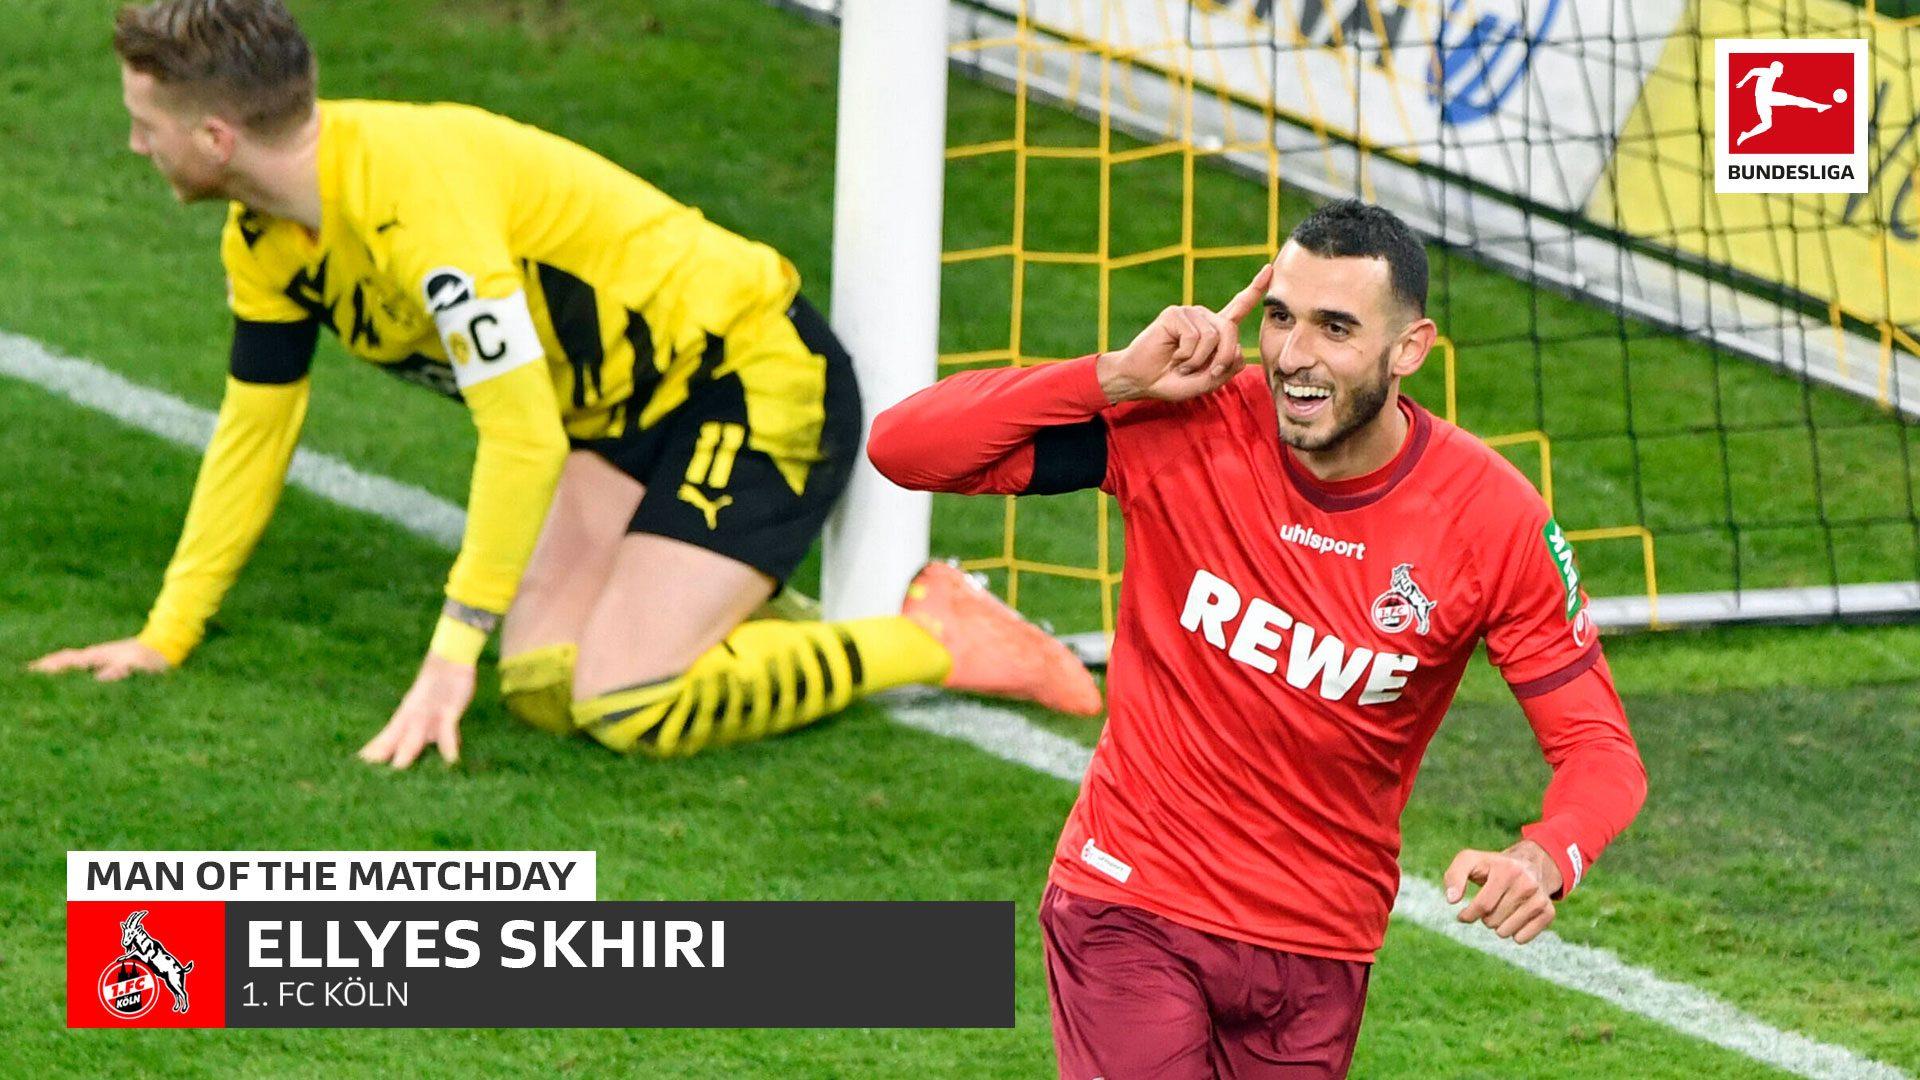 Bundesliga   Ellyes Skhiri: MD9's Man of the Matchday helping Cologne to a  historic win at Borussia Dortmund